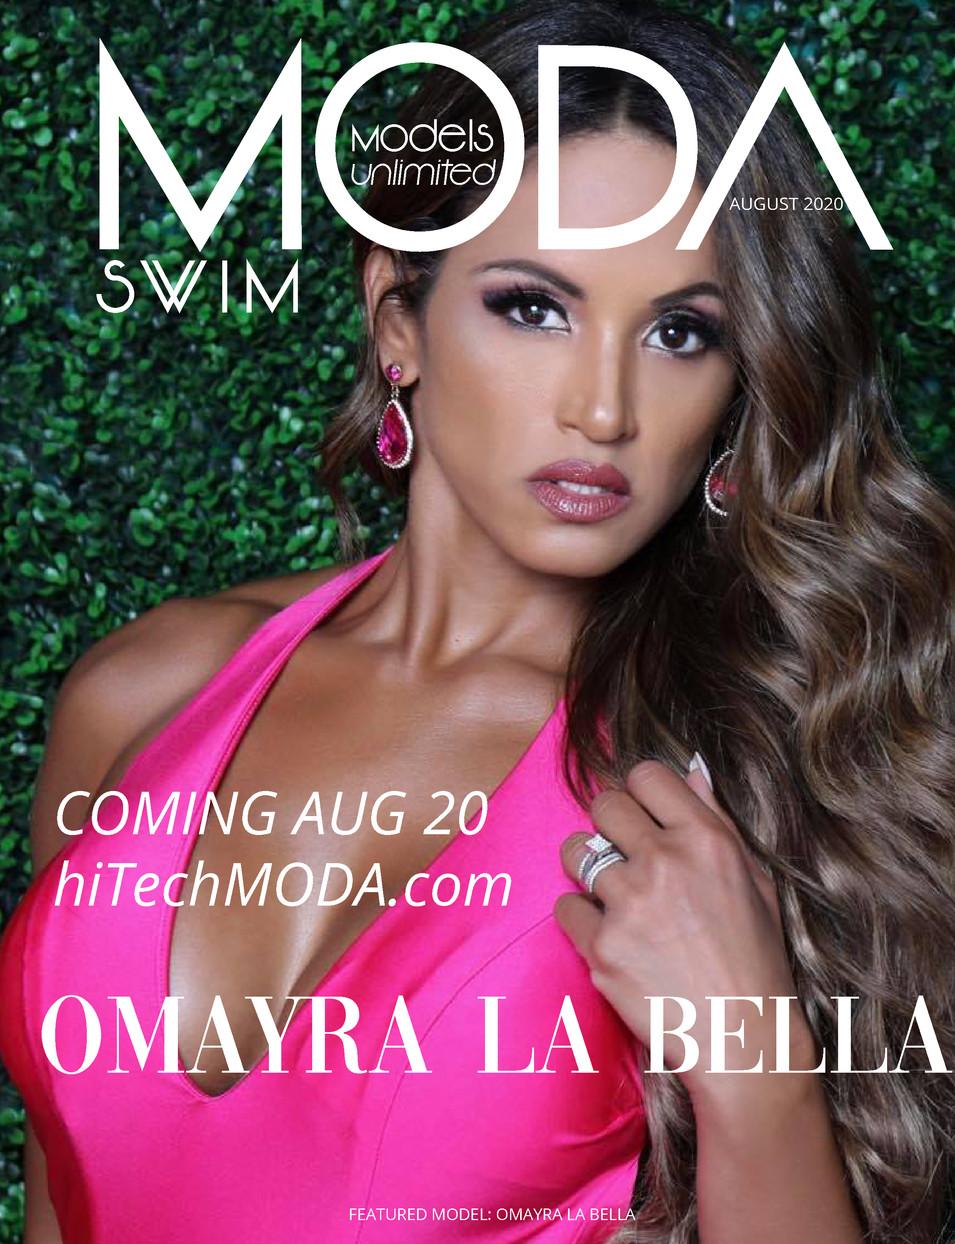 Moda Models Unlimited Swim Omayra La Bella